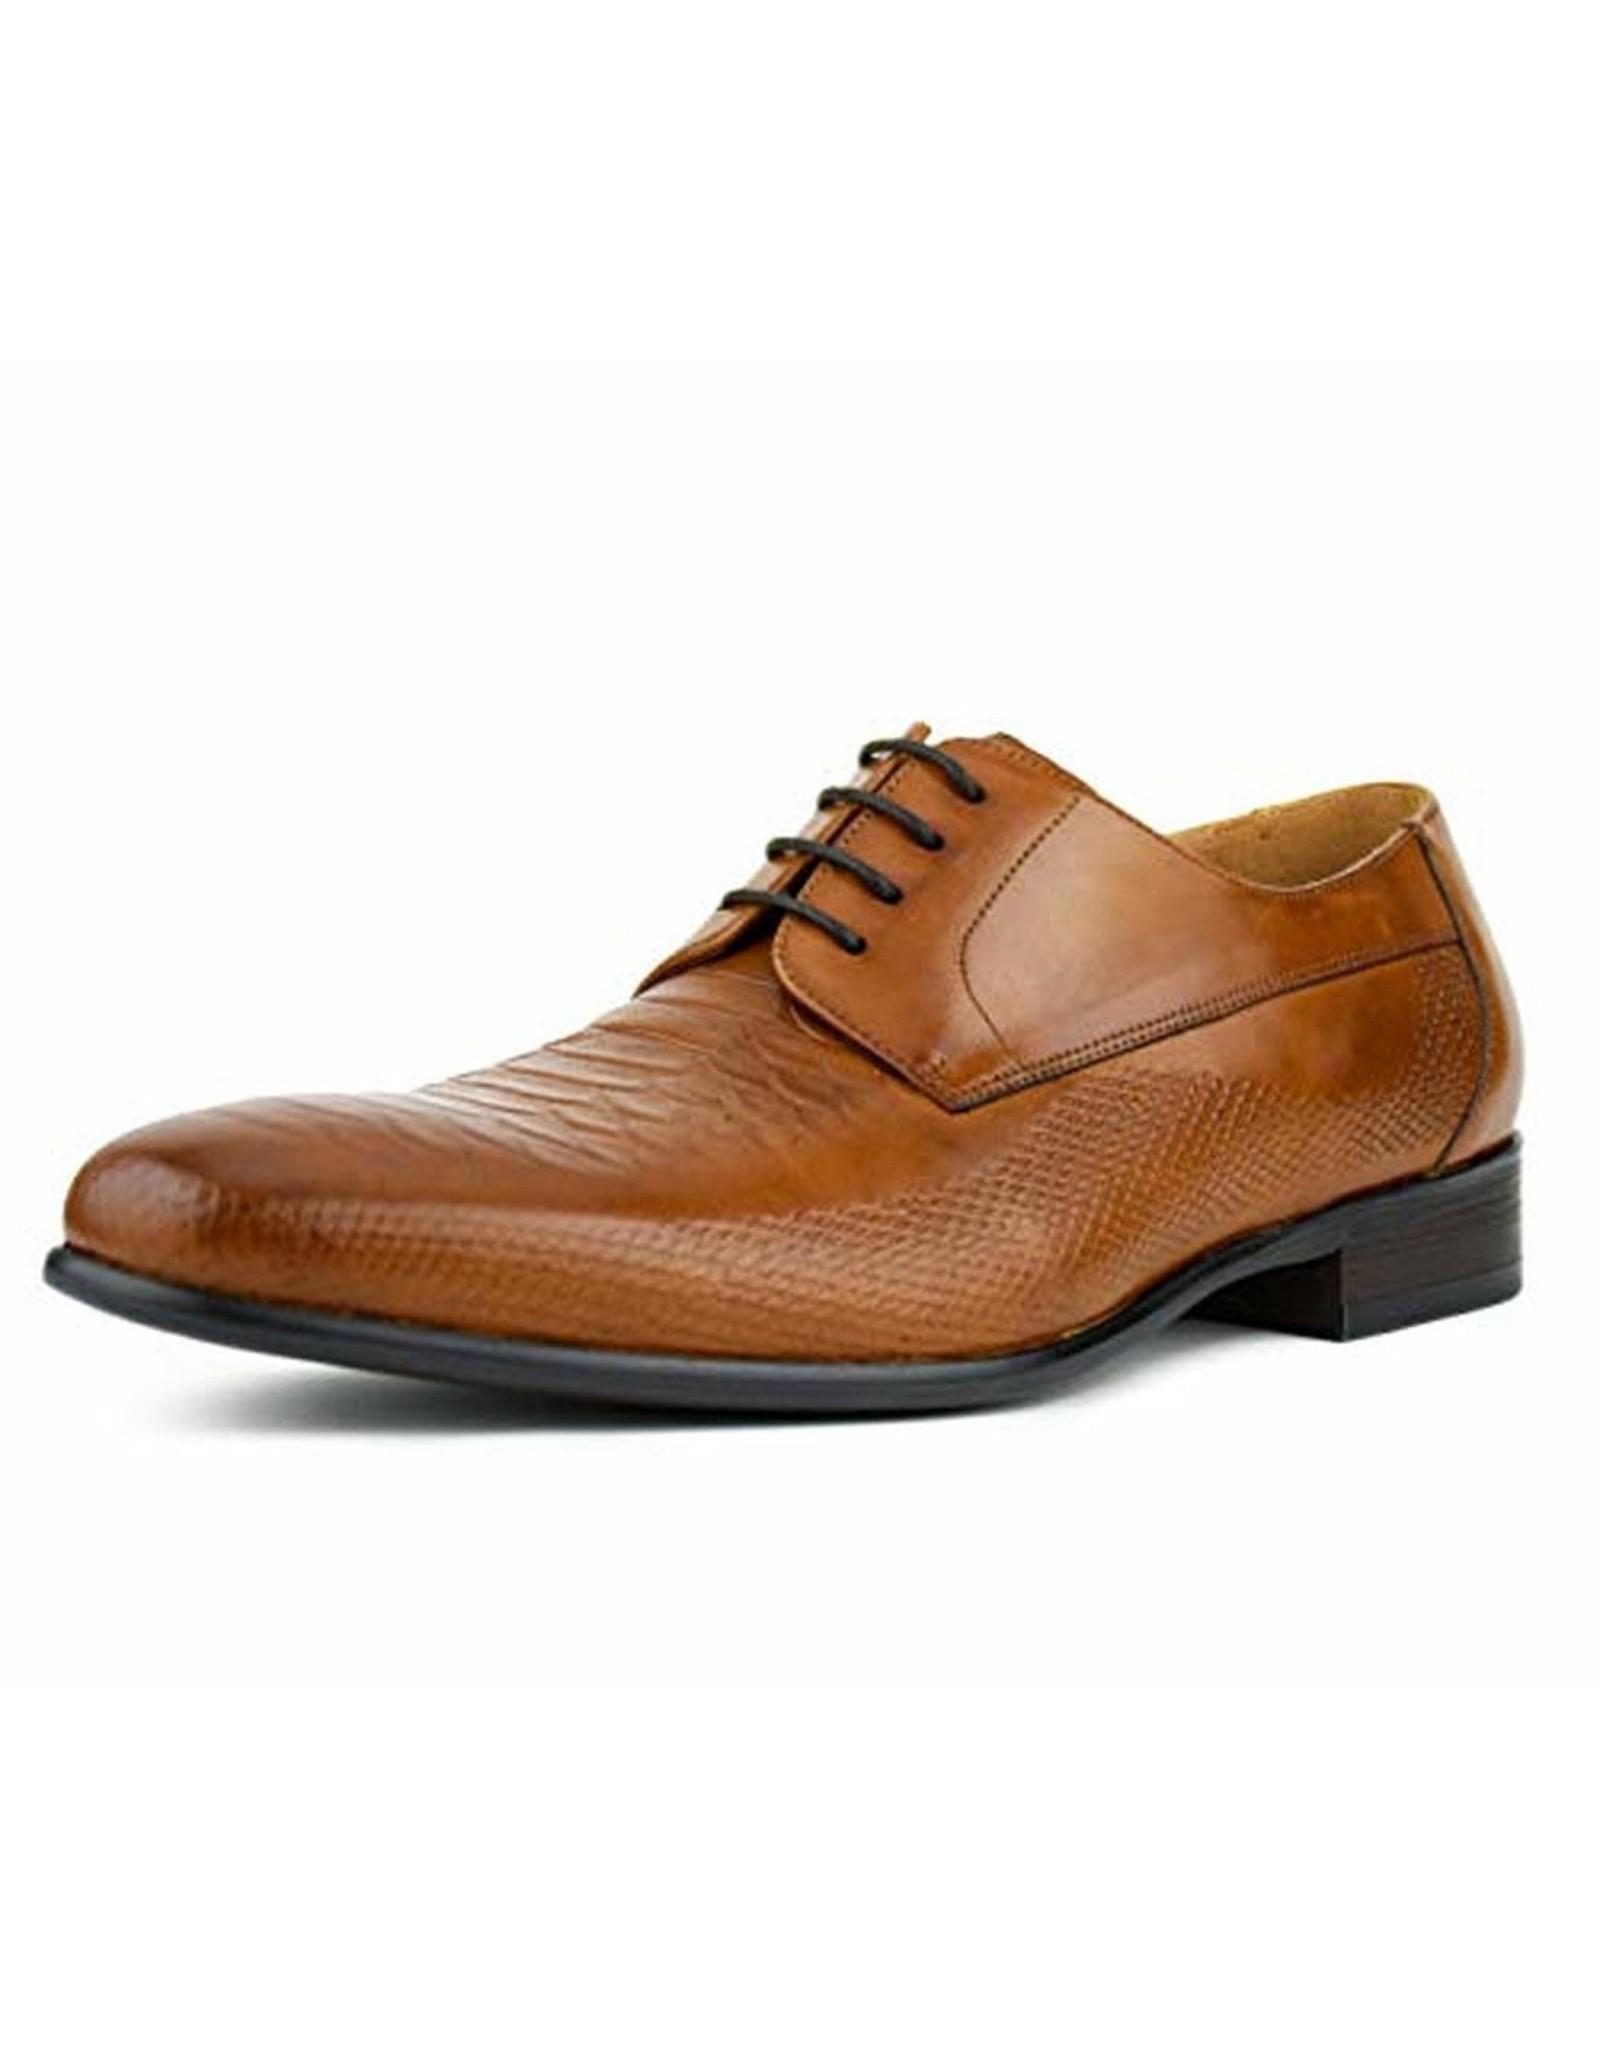 Asher Green Asher Green Leather Dress Shoe - AG1301 Tan